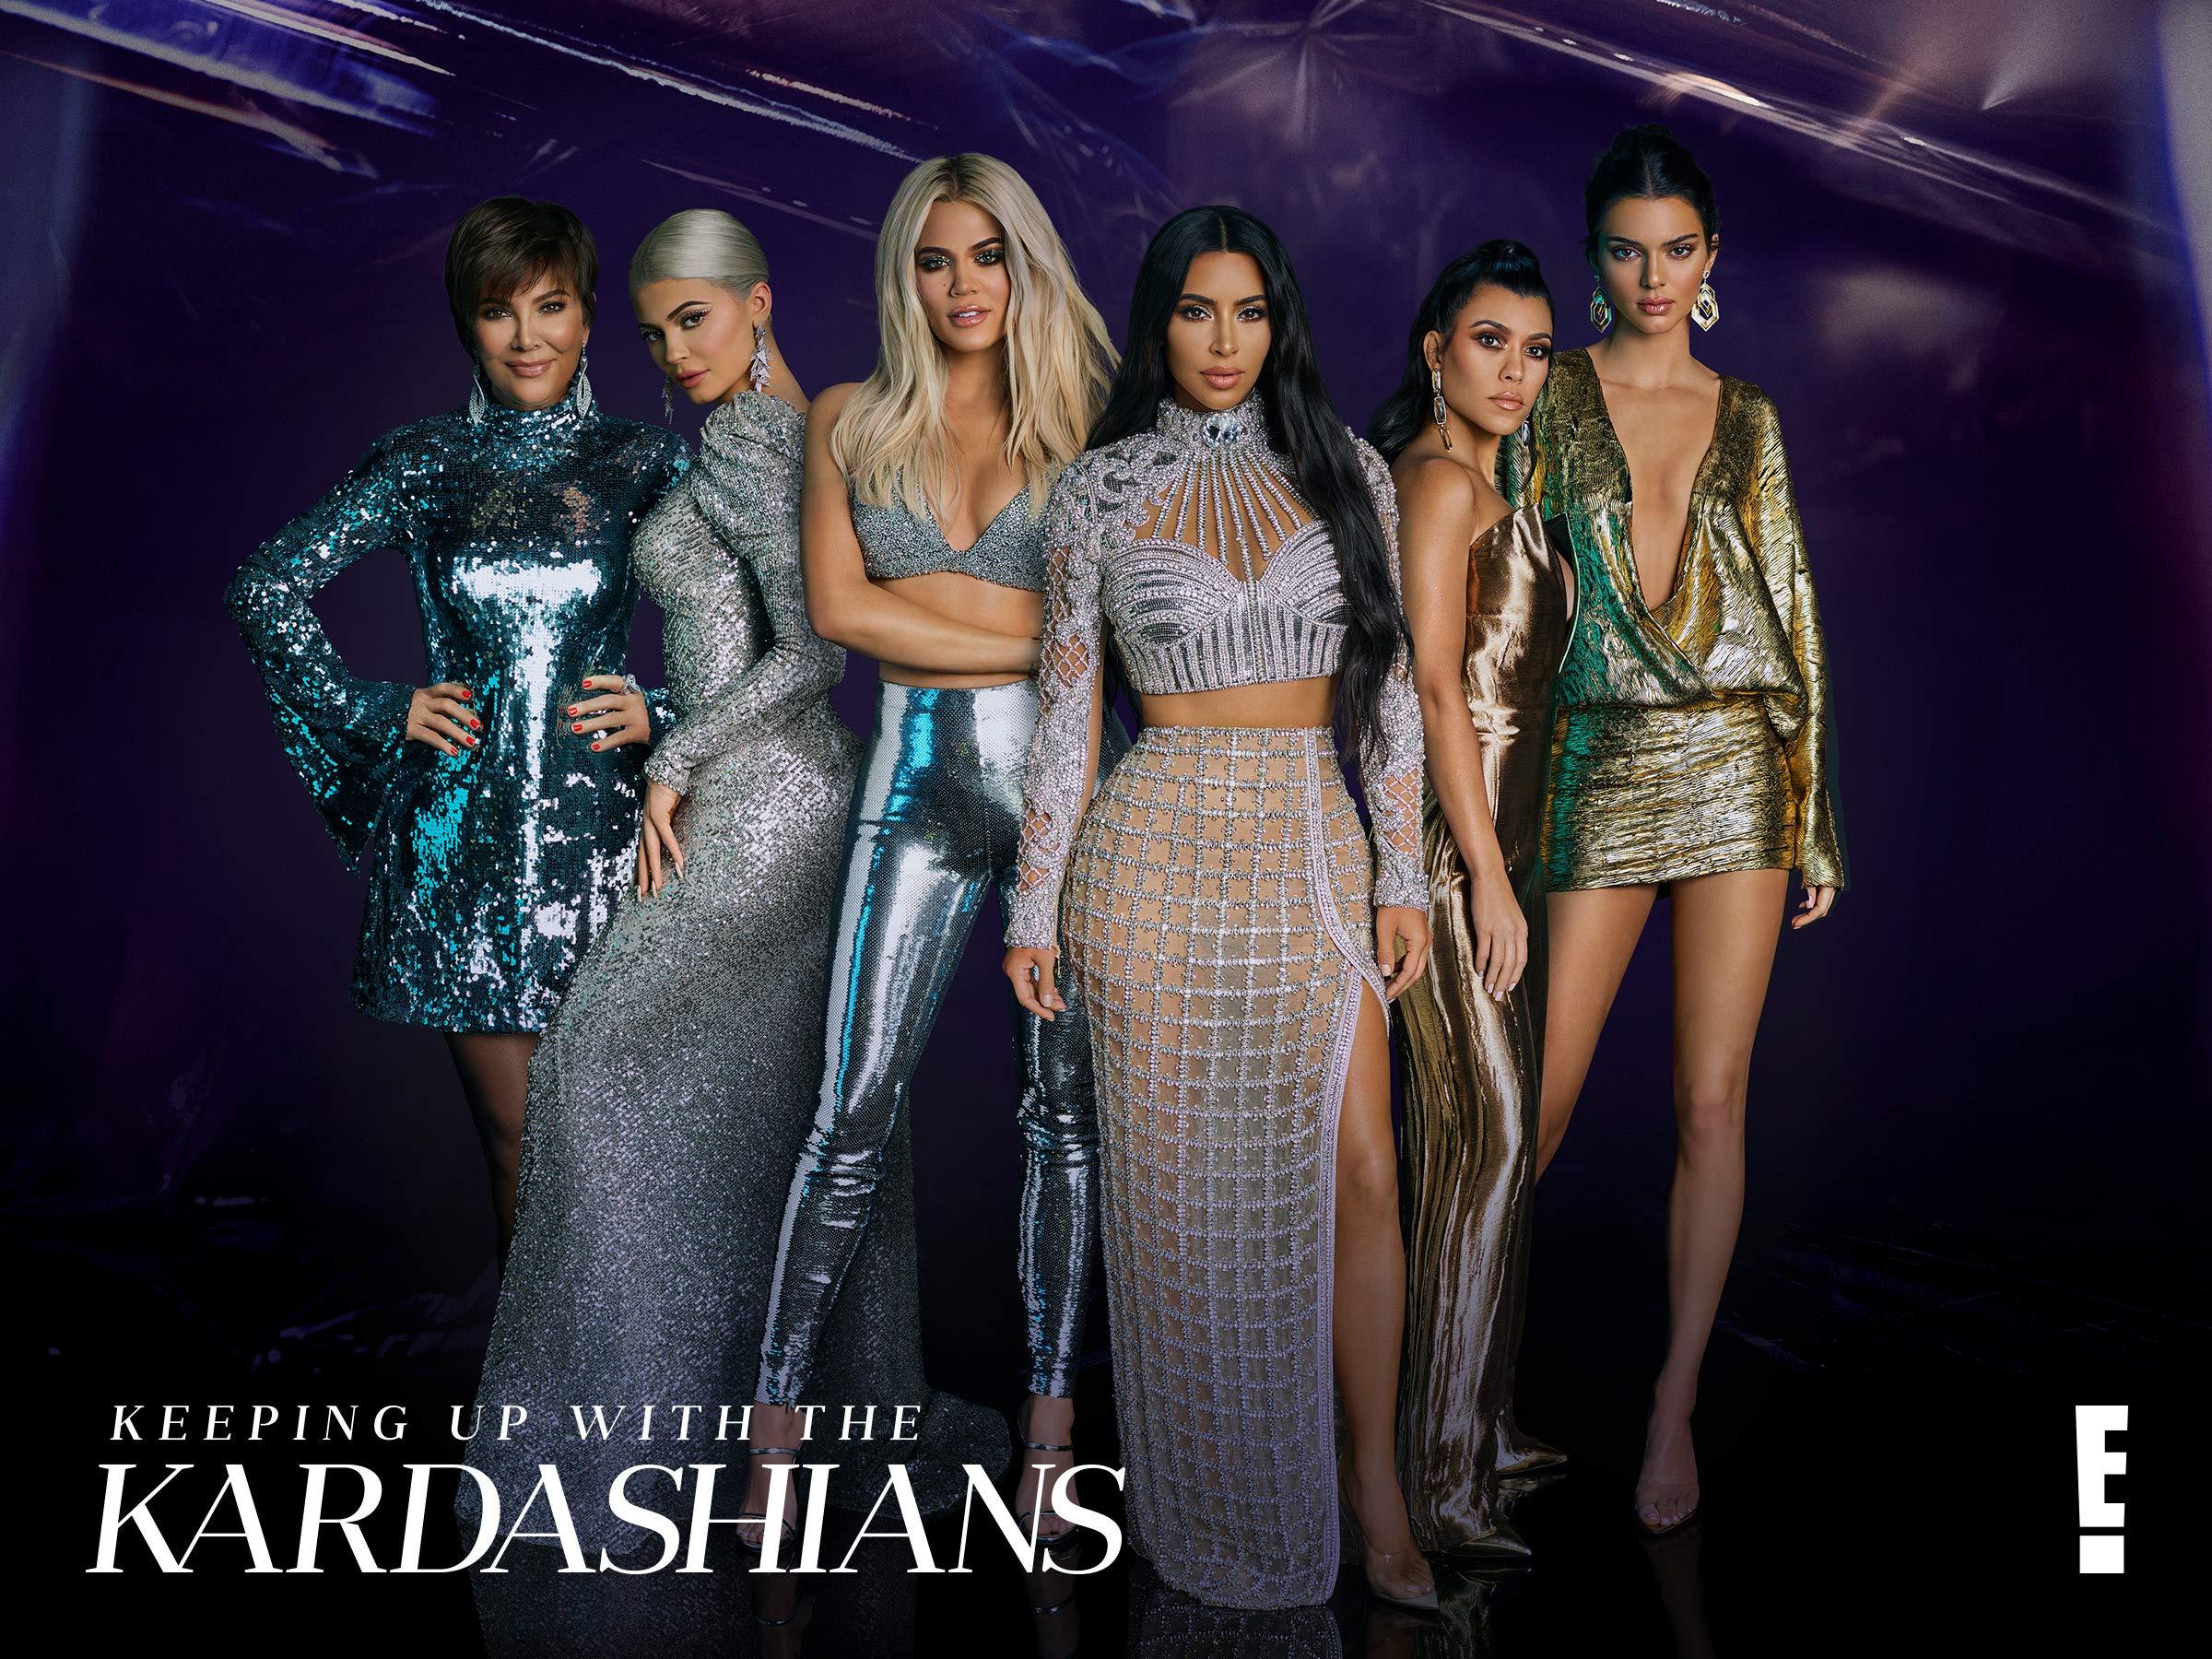 keeping up with the kardashians season 13 online free